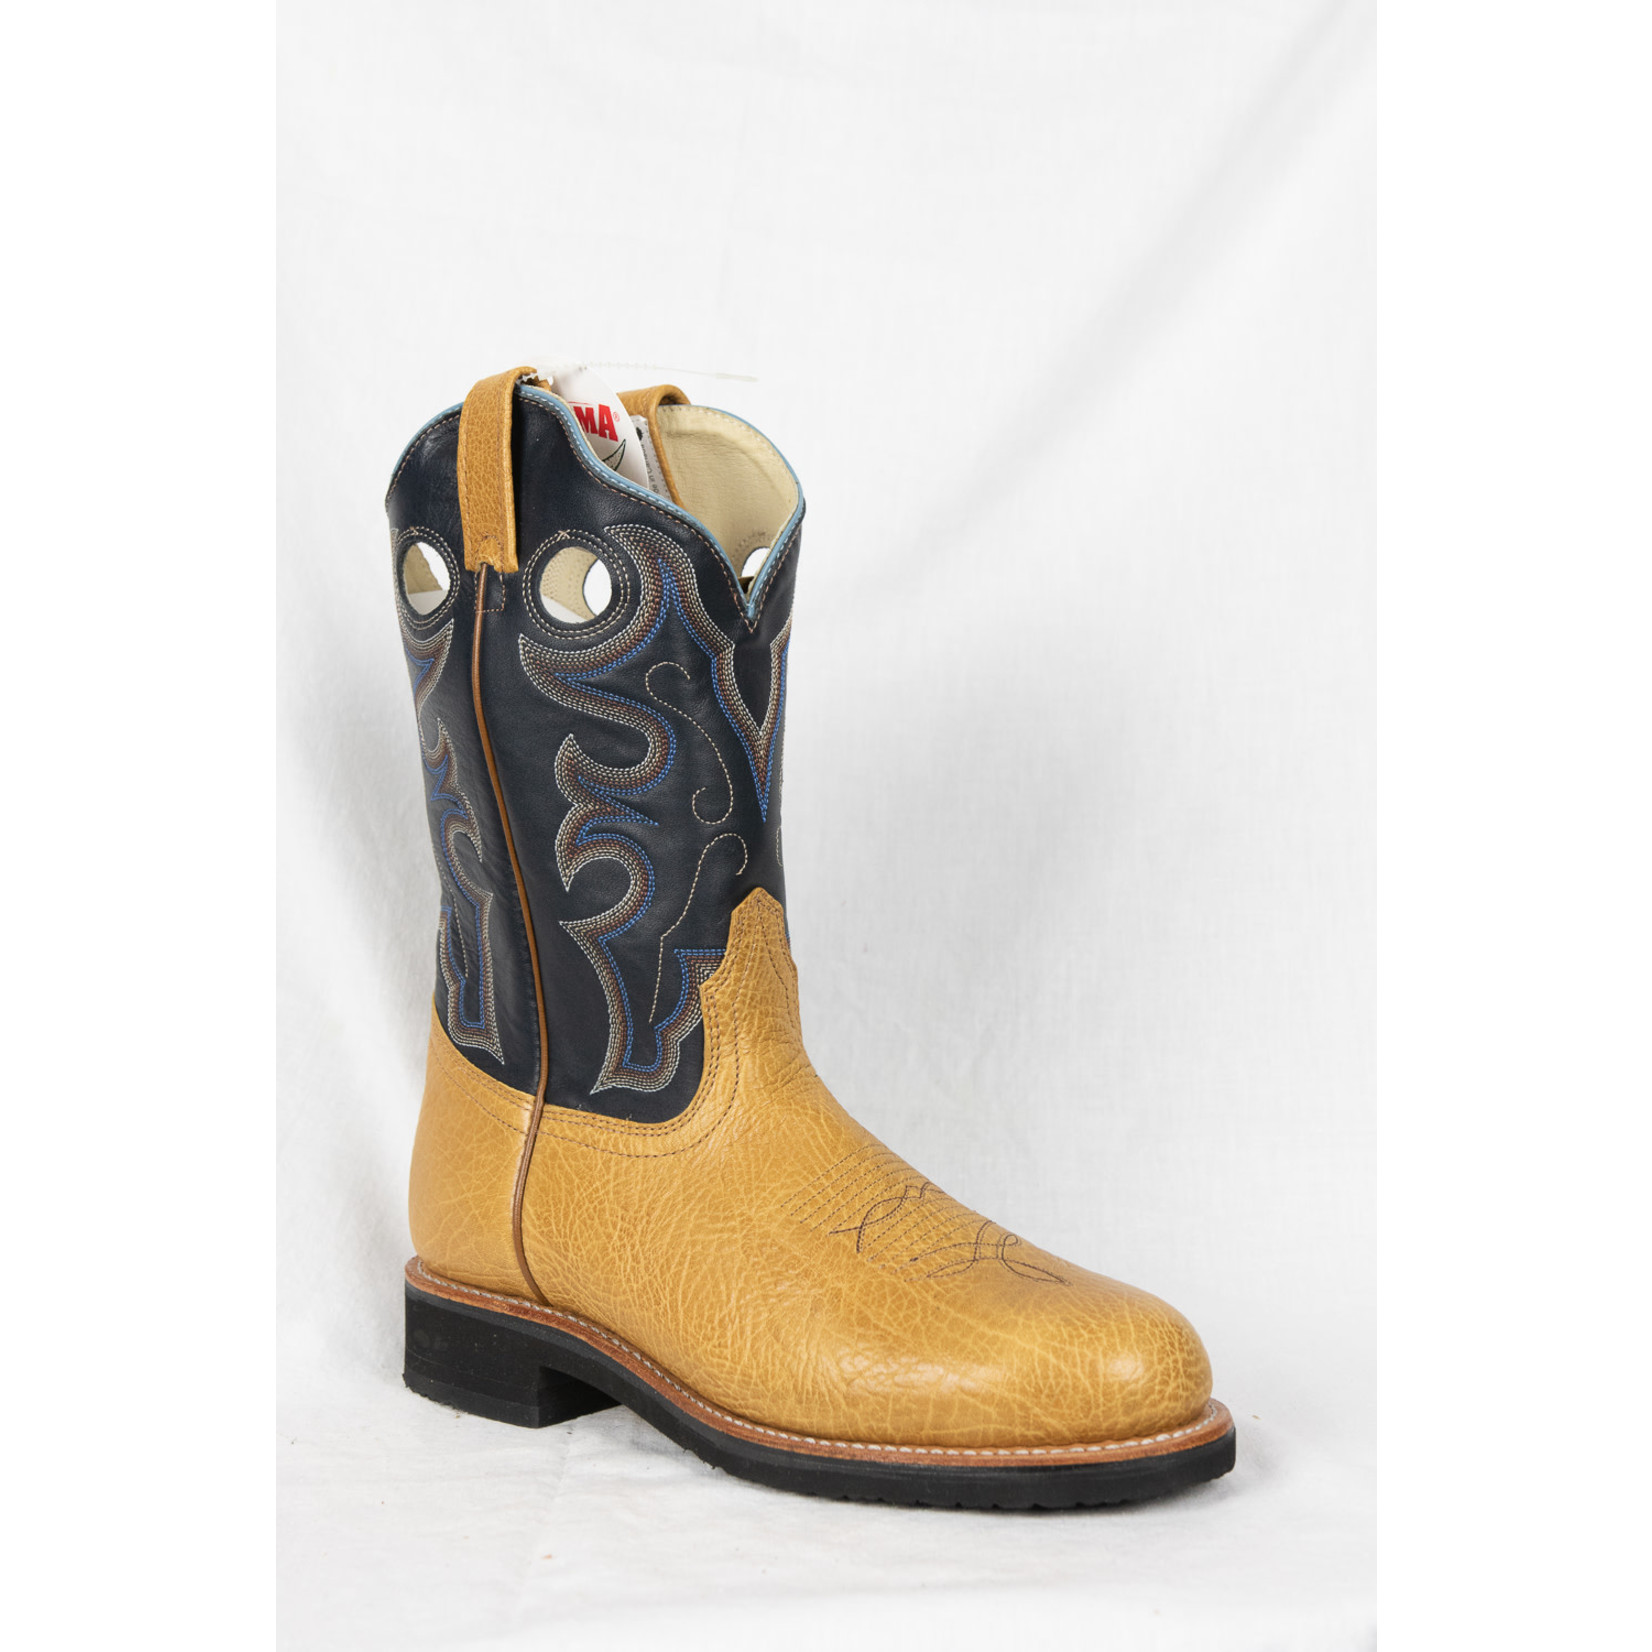 Brahma Brahma Canada West Women's Cowboy Boot 6005 D